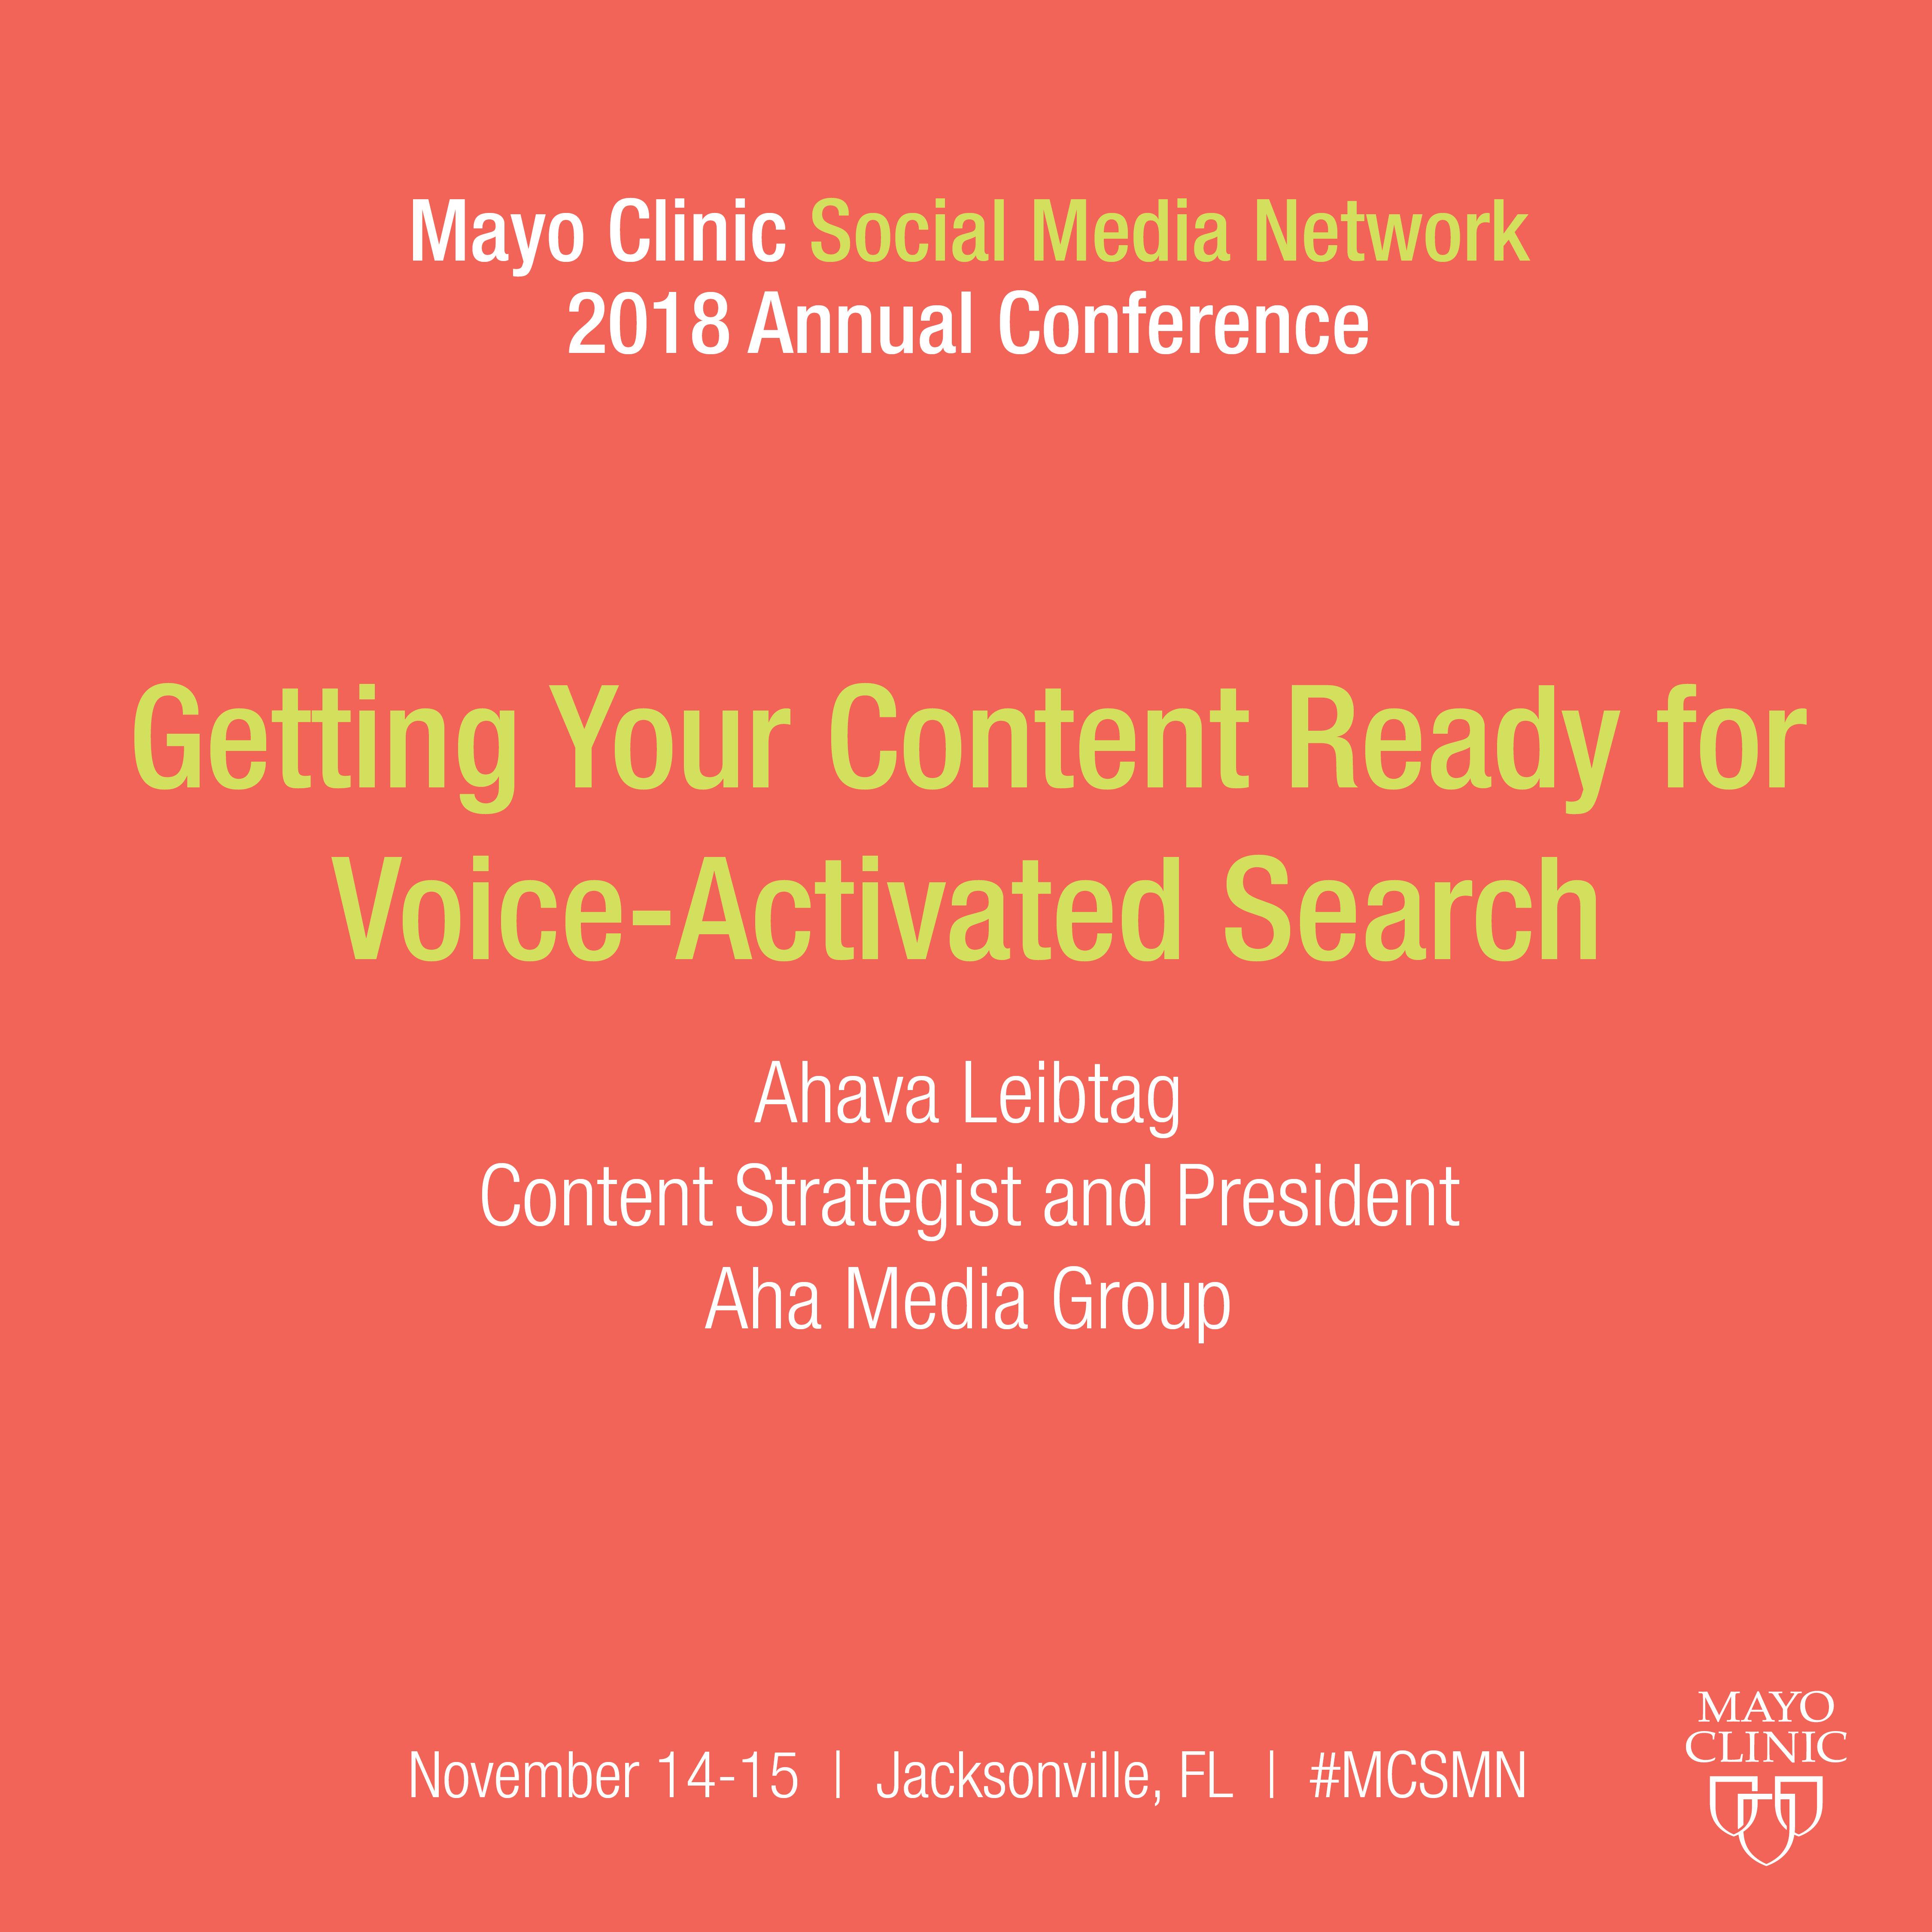 Preparing your Content for Voice